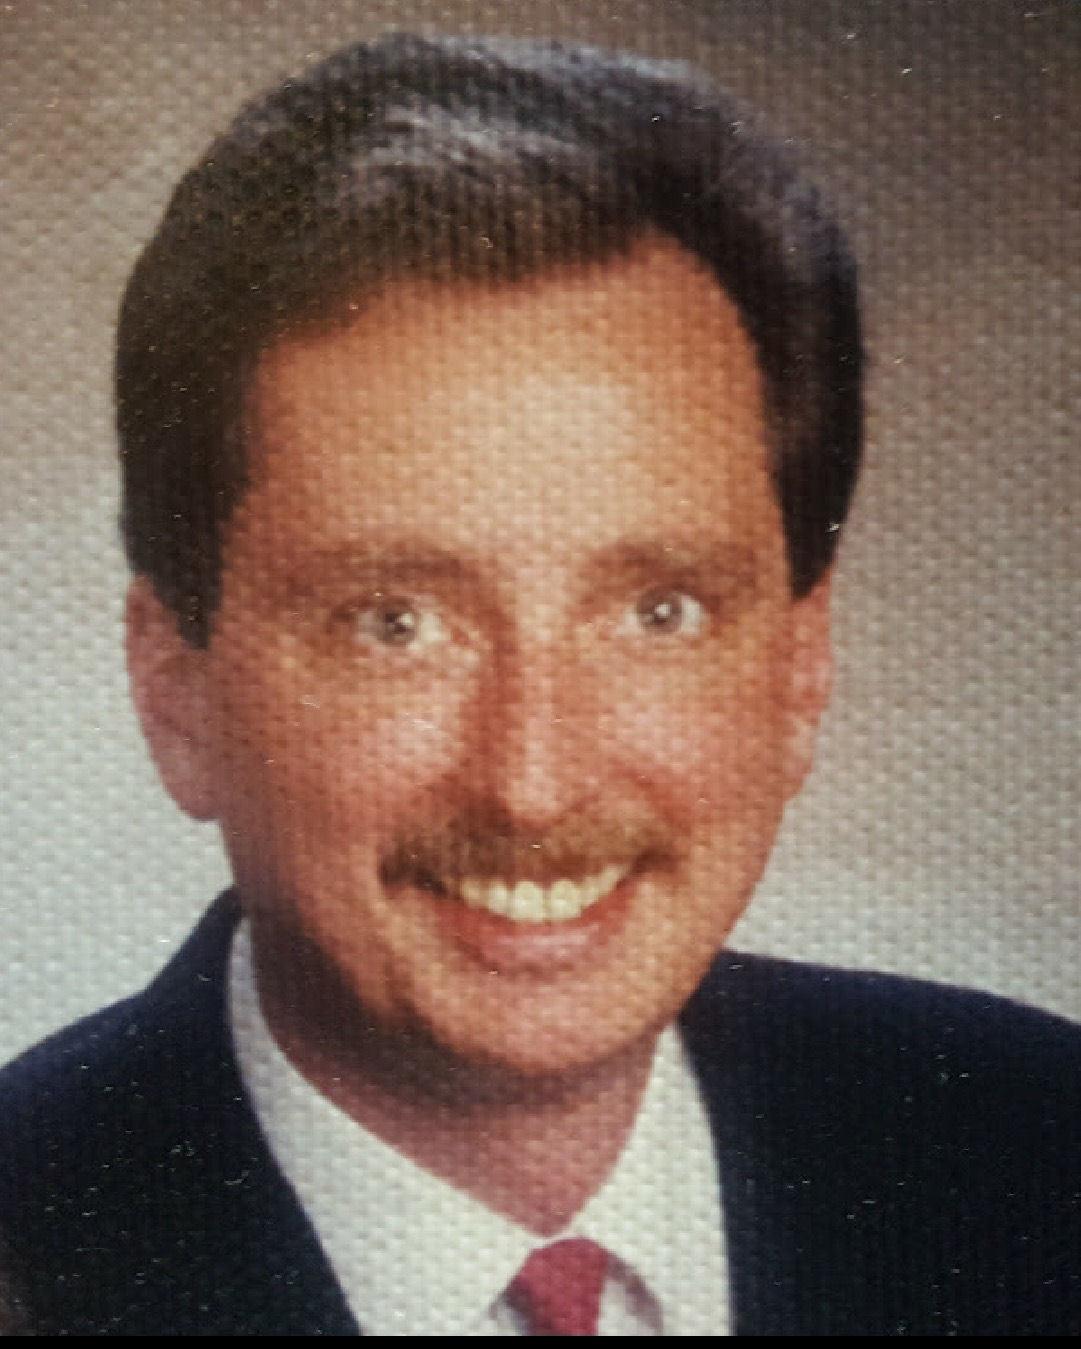 Bradley Dean Parlari